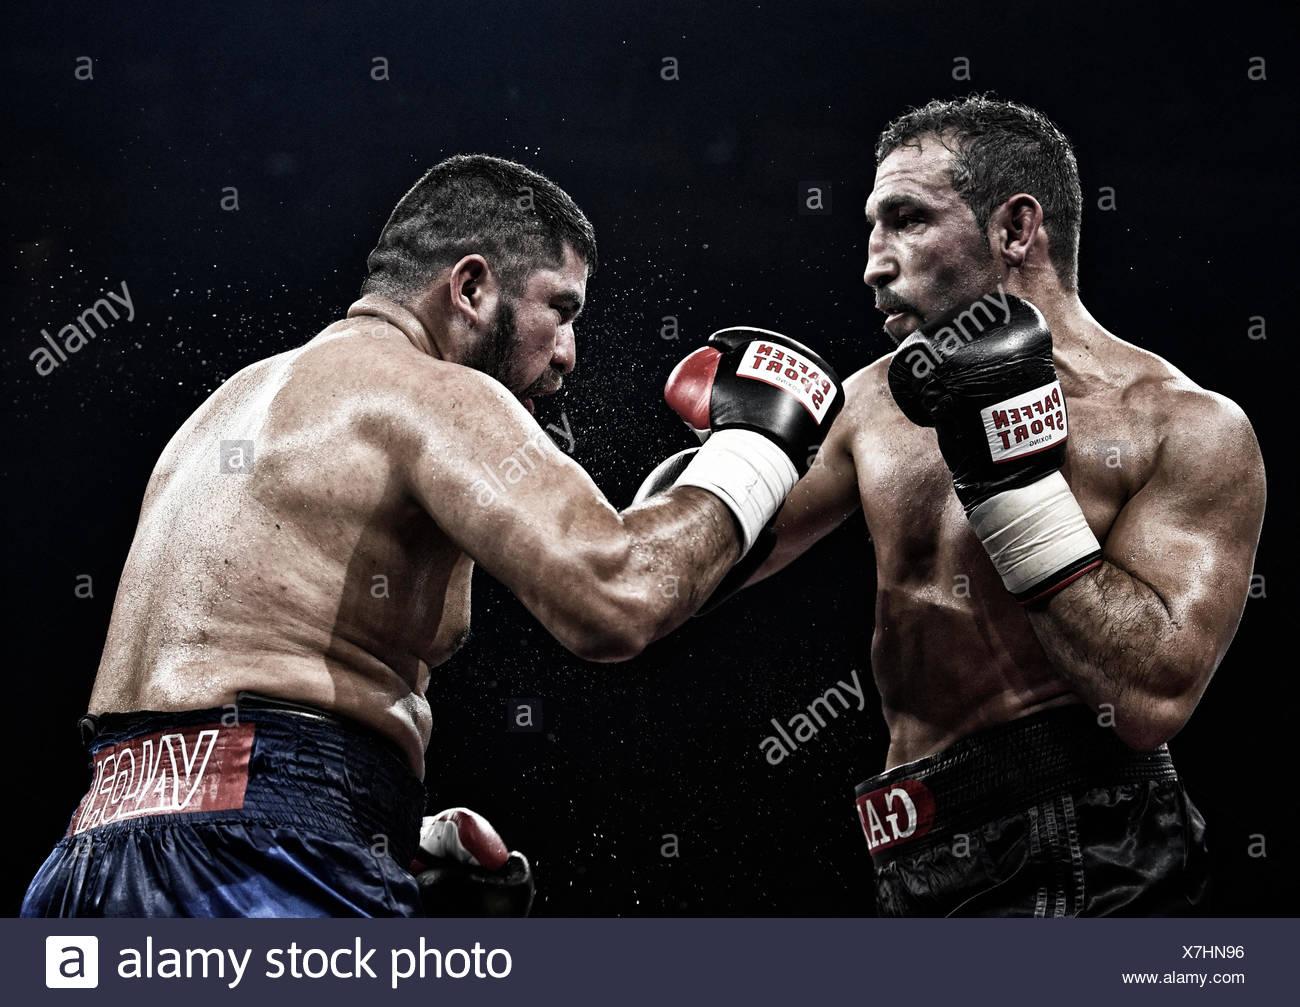 Boxing match, Firat Arslan, GBR, black trousers against Alejandro Emilio Valori, ARG, blue trousers, Hanns-Martin-Schleyer Halle - Stock Image